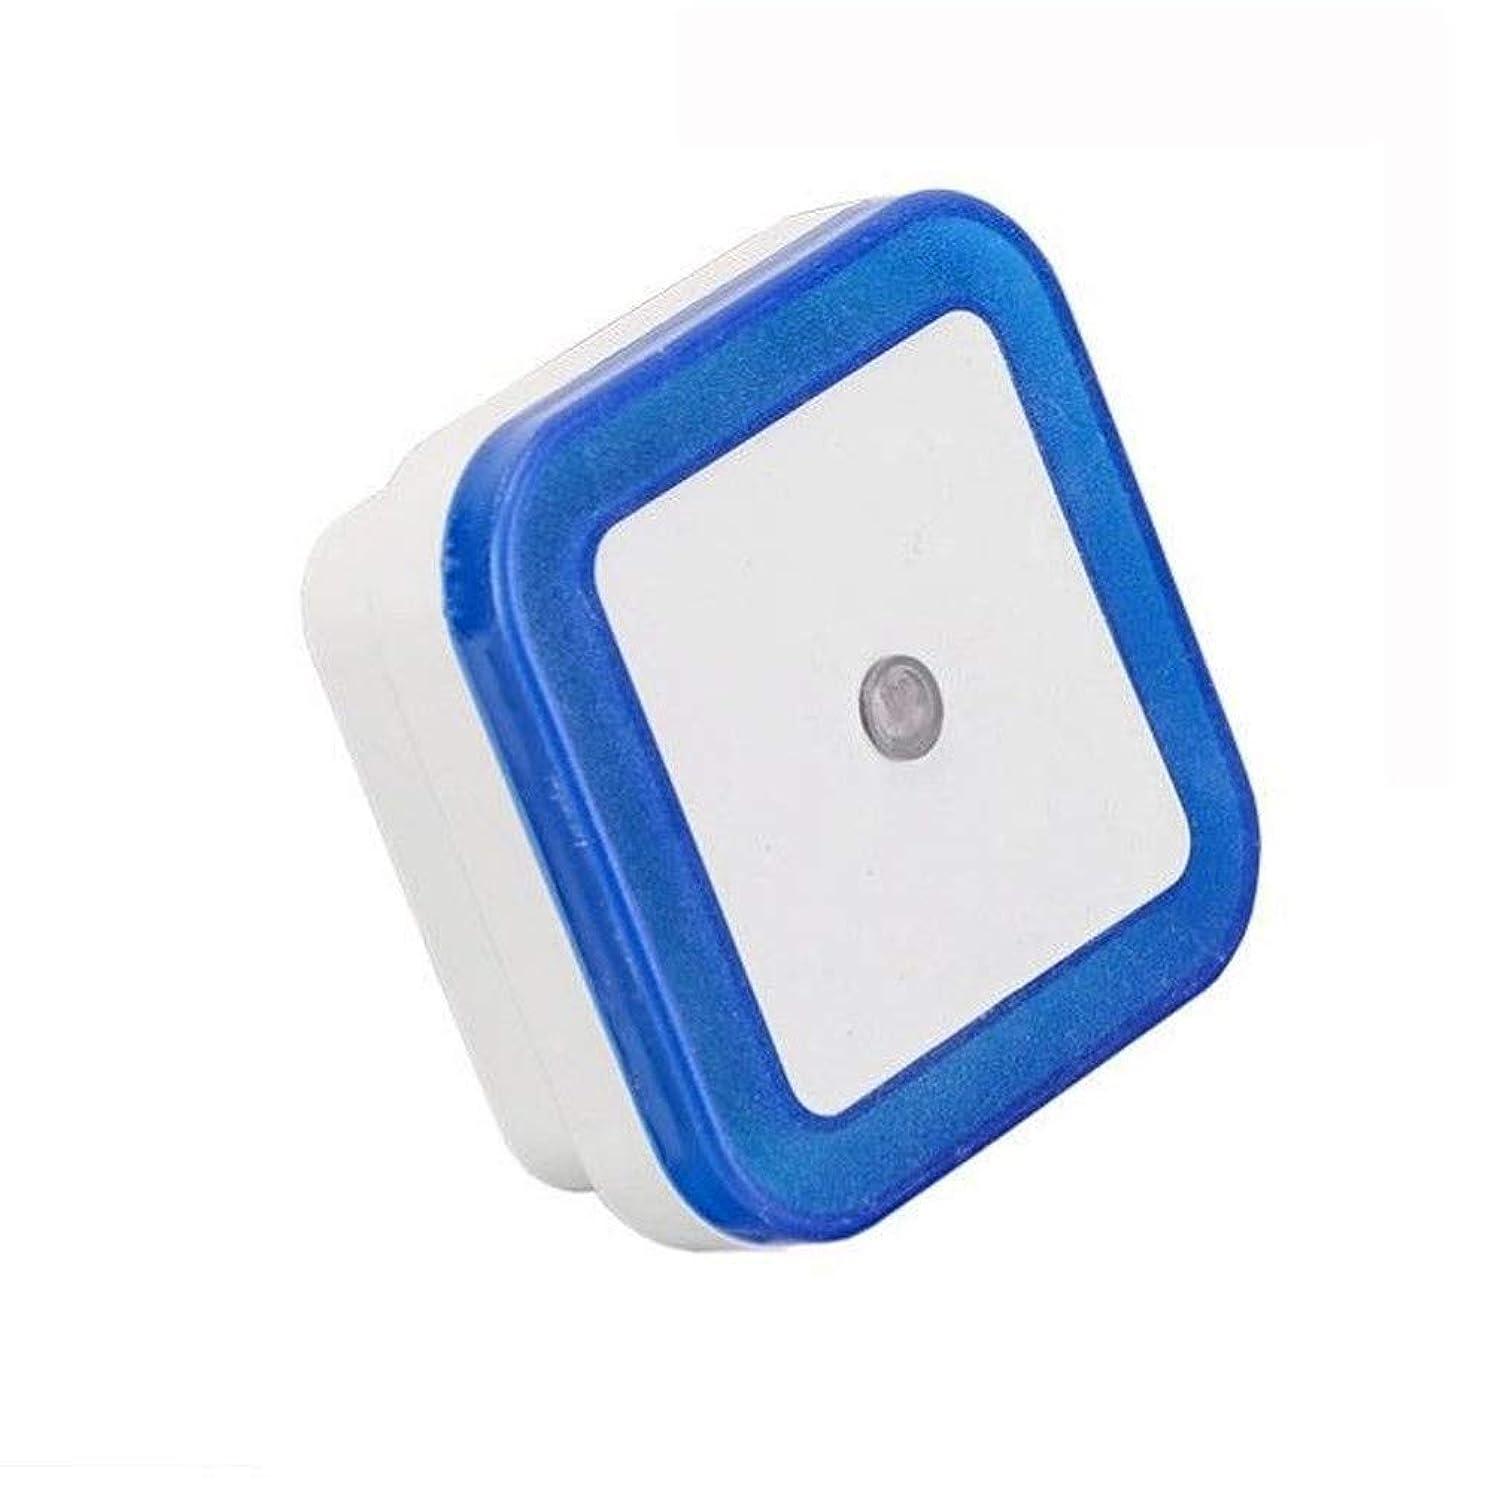 Sayhr??2Pcs 0.5W Plug-in Auto Sensor Control LED Night Light Lamp for Bedroom Hallway